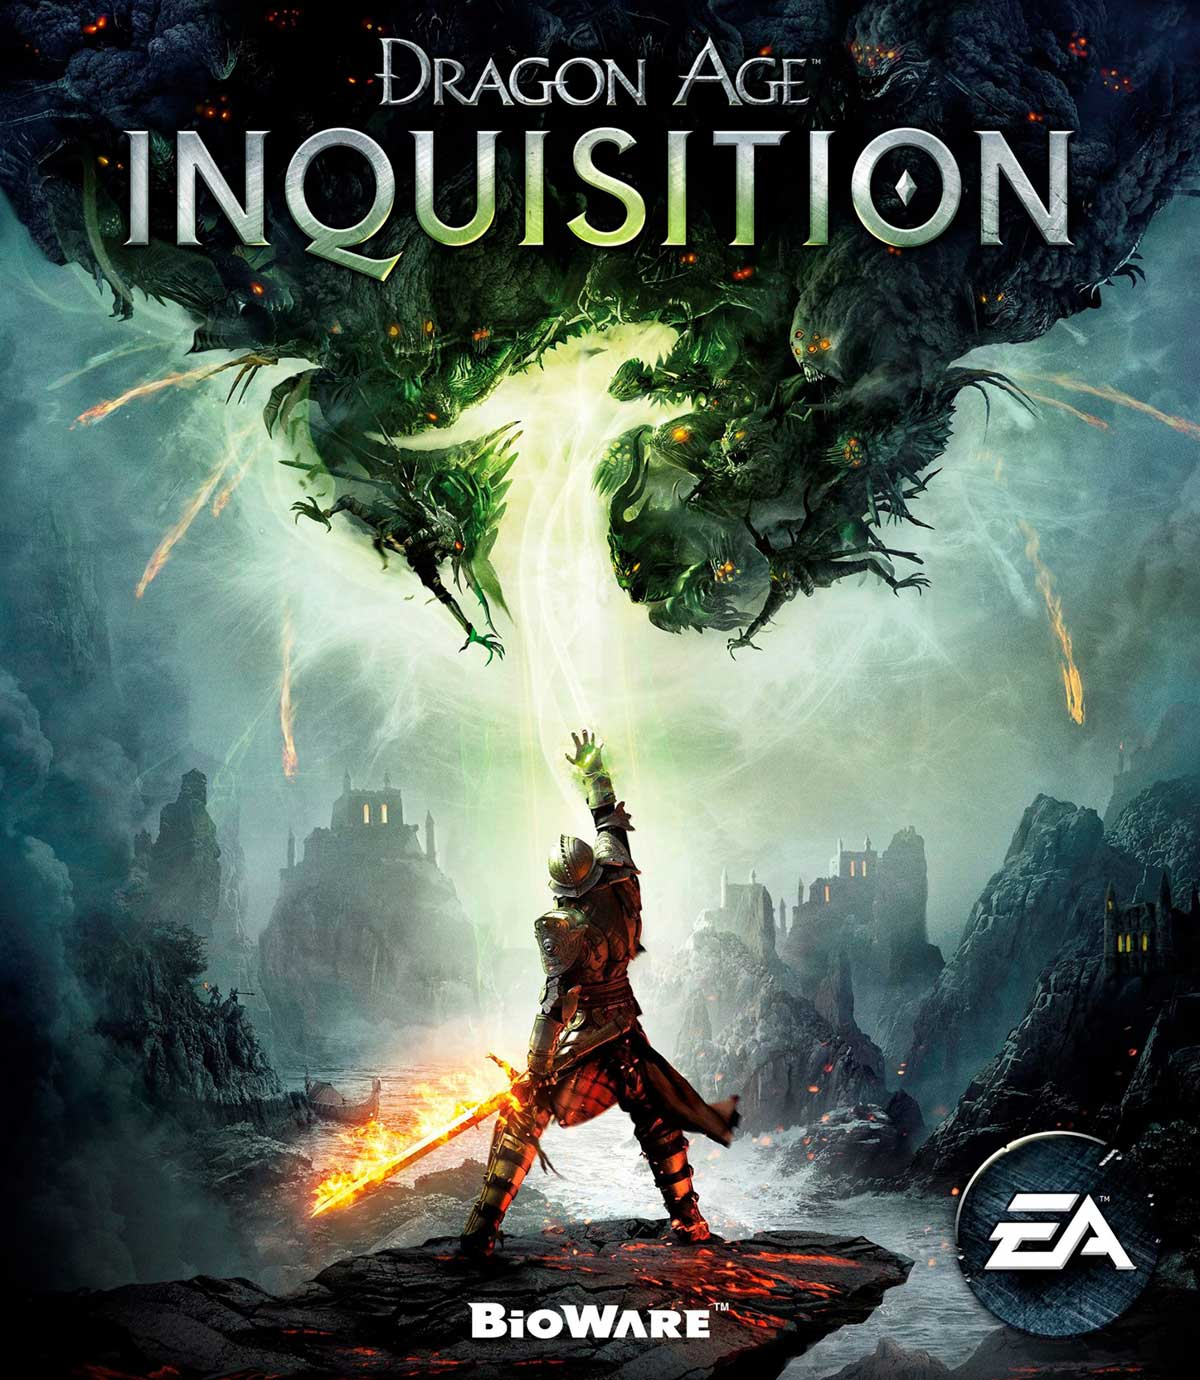 dragon_age_inquisition_boxart_bioware.jpg